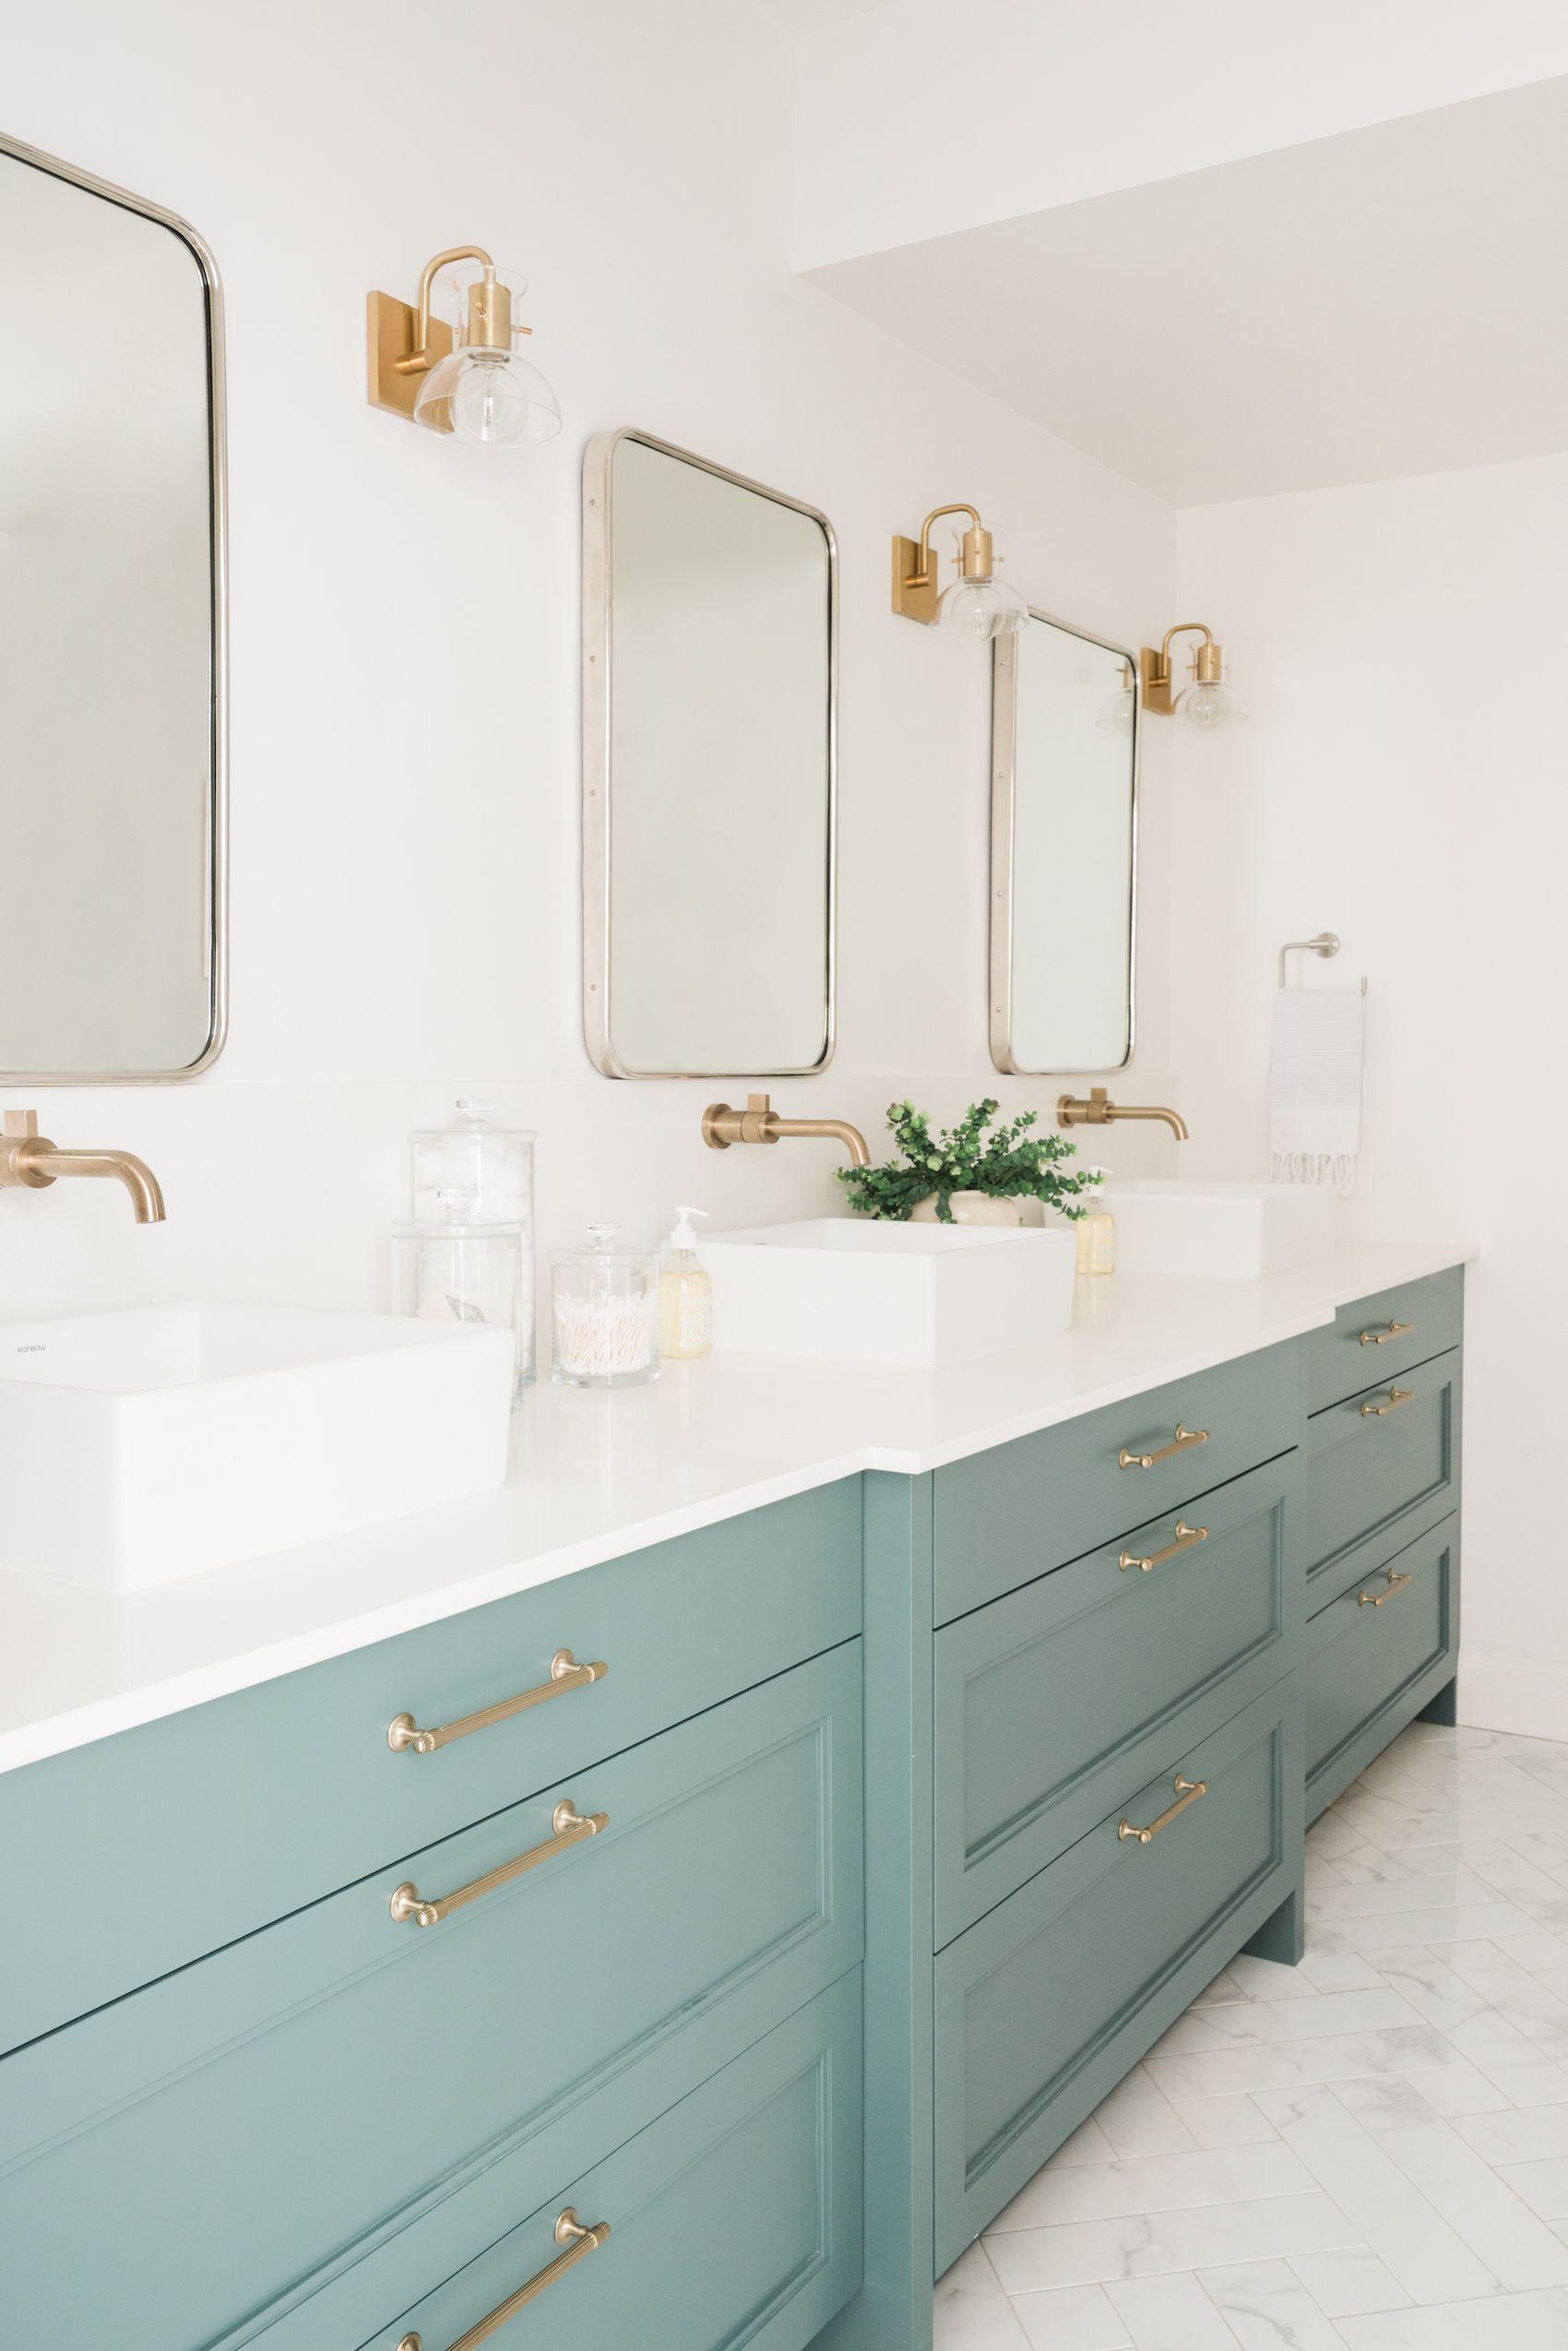 Cabinet paint color is Benjamin Moore Jack Pine | Pick a Paint Color ...